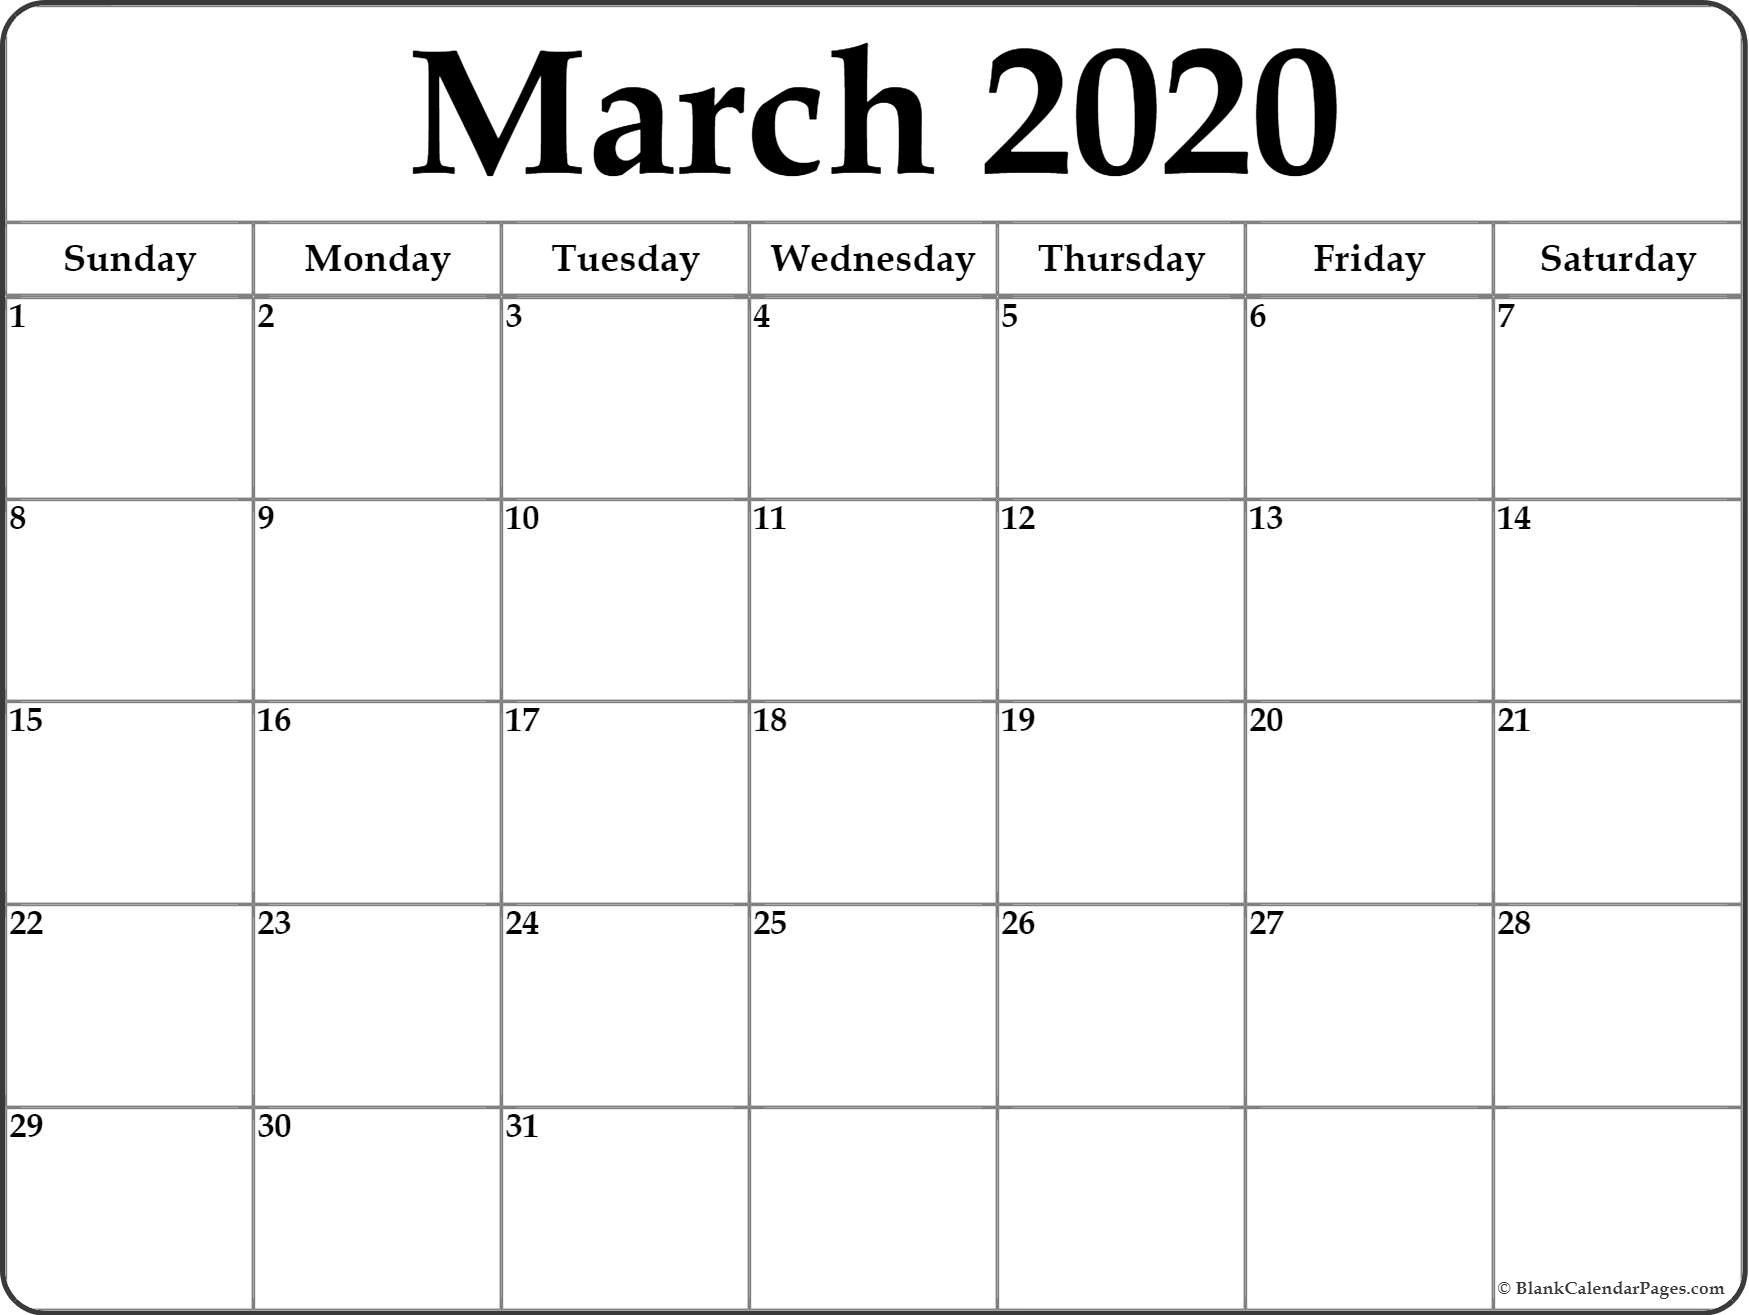 March 2020 Blank Calendar Templates March 2020 Calendar Templates